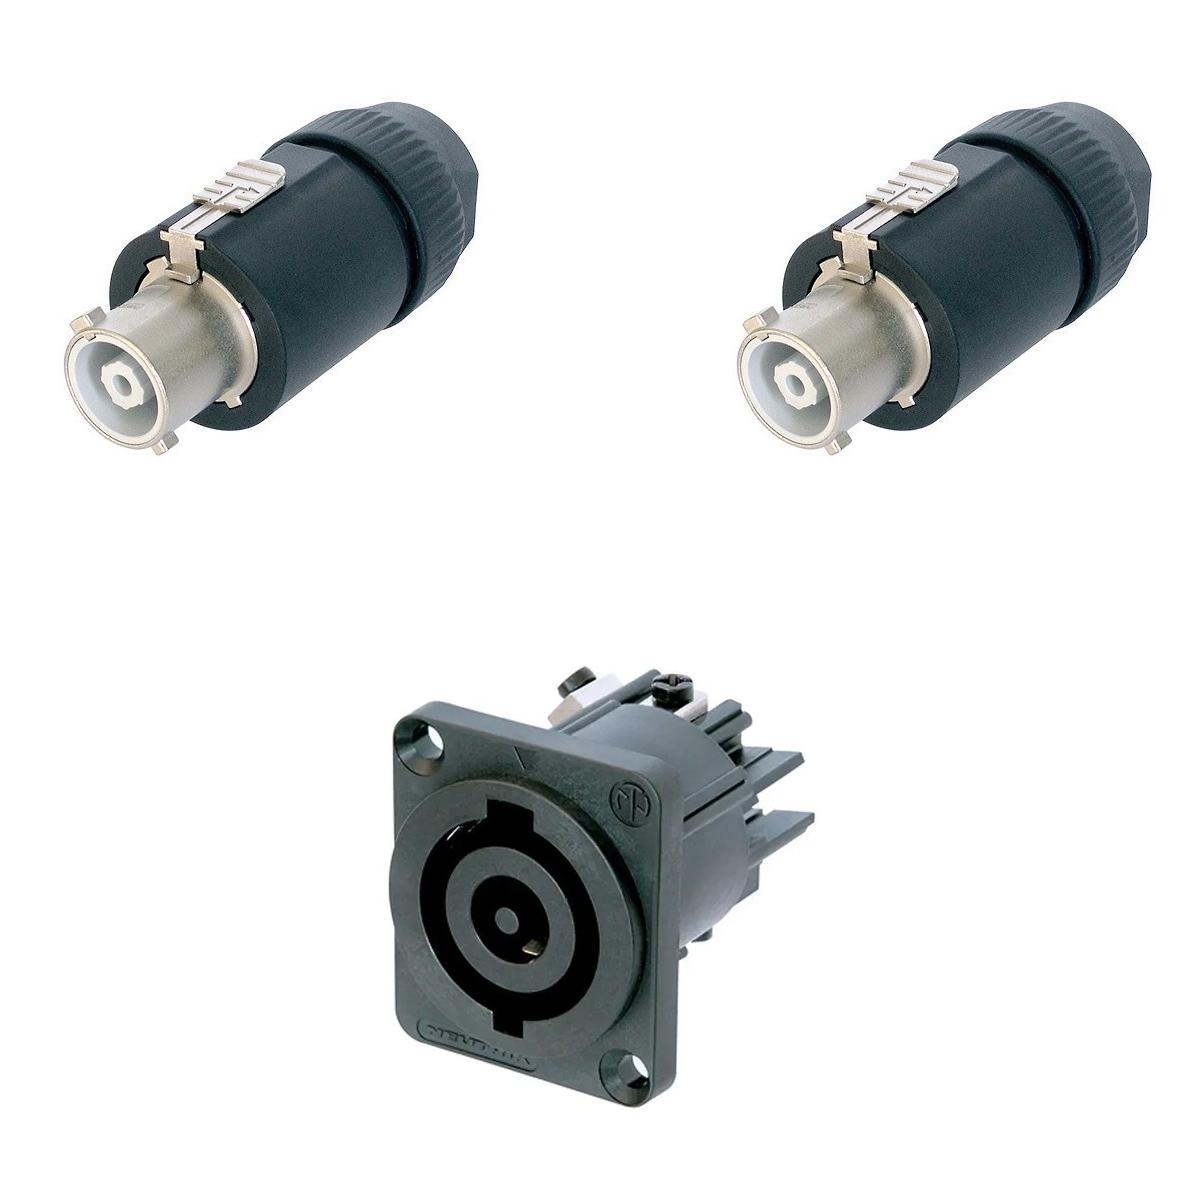 Kit PowerCON com 2 NAC3FC-HC + 1 NAC3MP-HC NEUTRIK